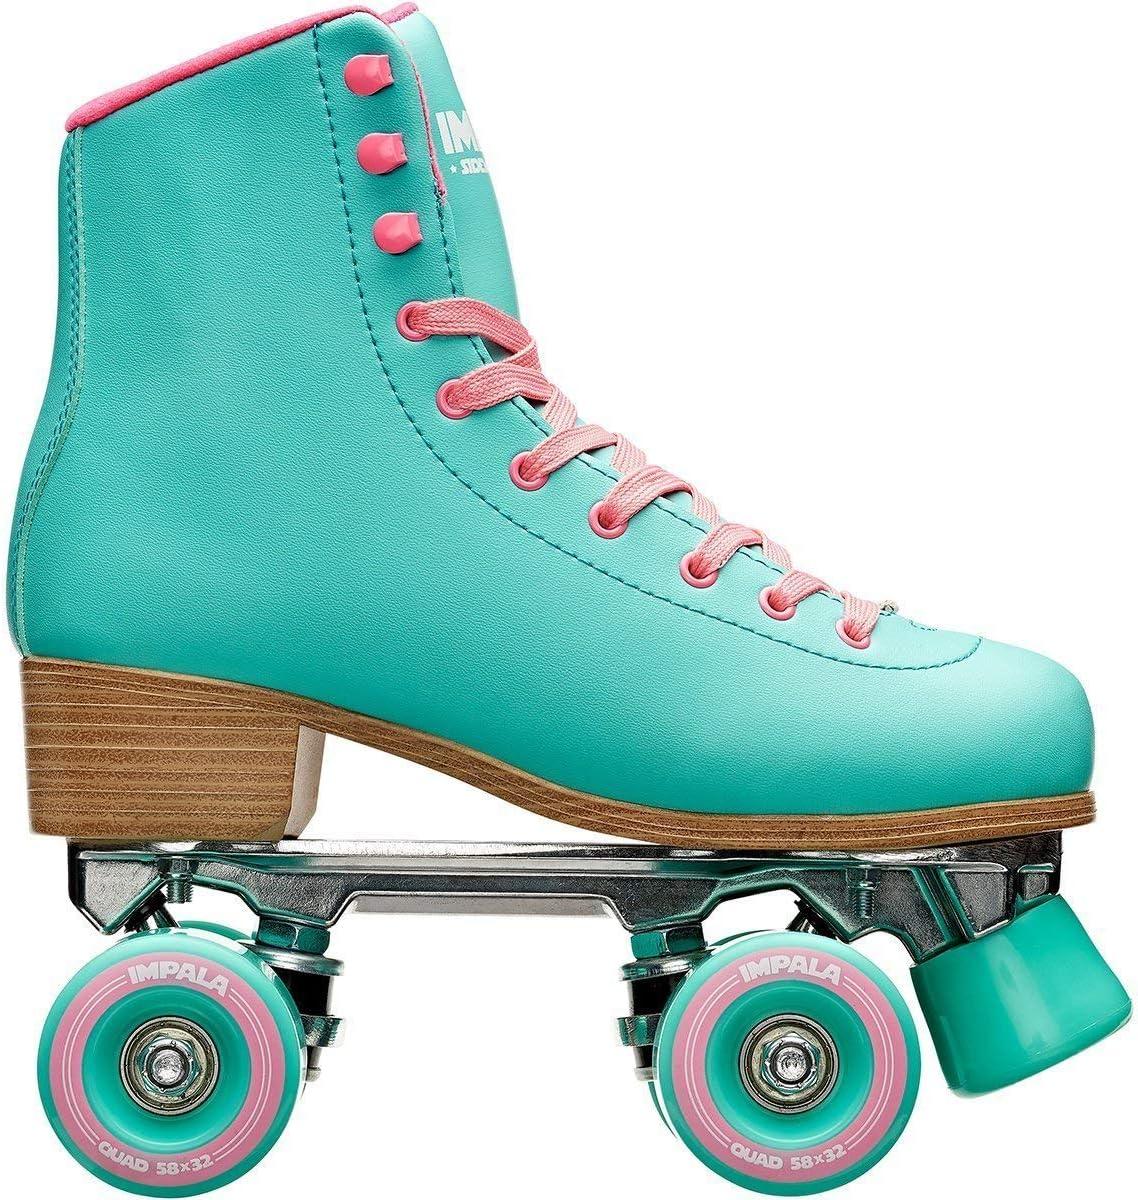 US Mens 1, Womens 3 Leopard 3 Impala Rollerskates Girls Impala Quad Skate Big Kid//Adult